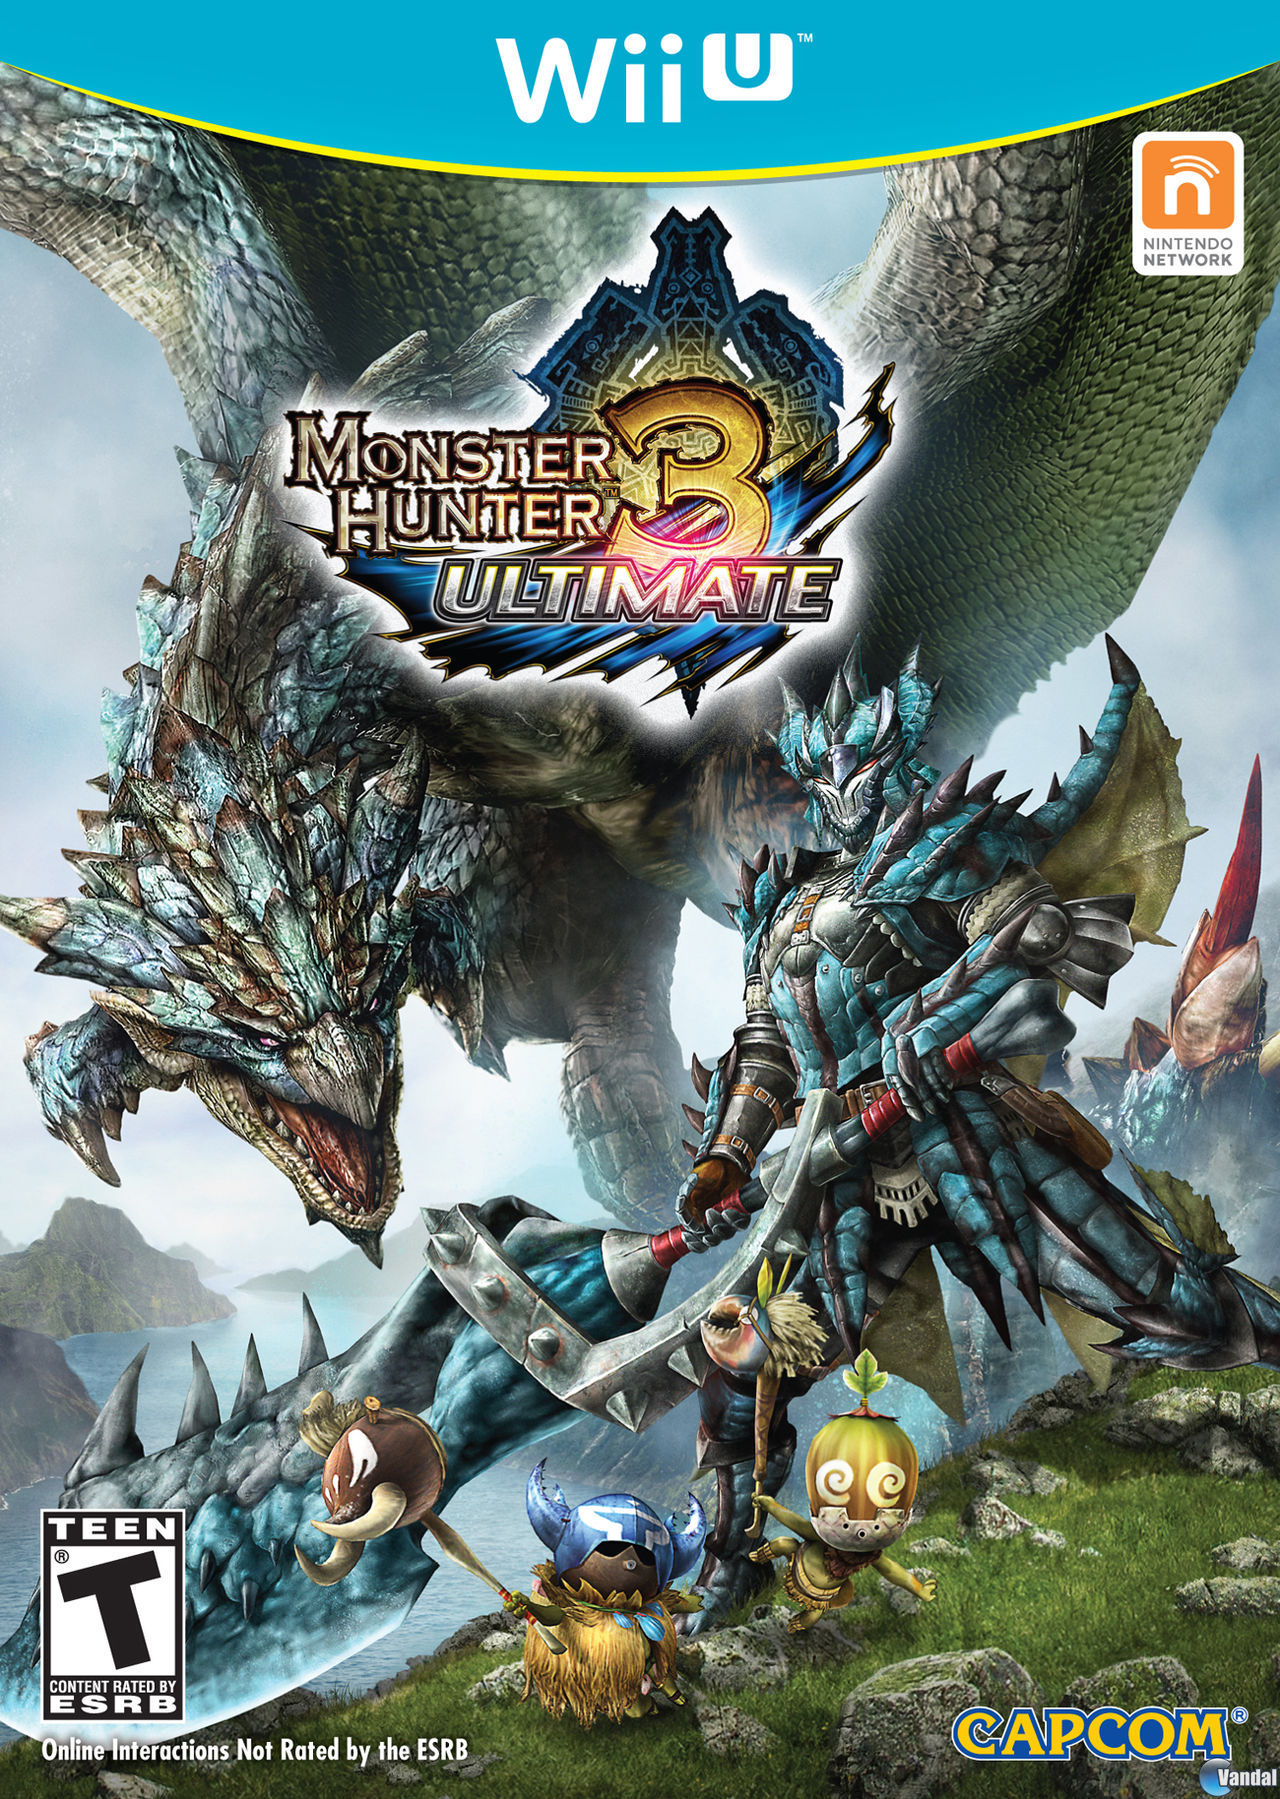 Desvelada la portada americana de Monster Hunter 3 Ultimate